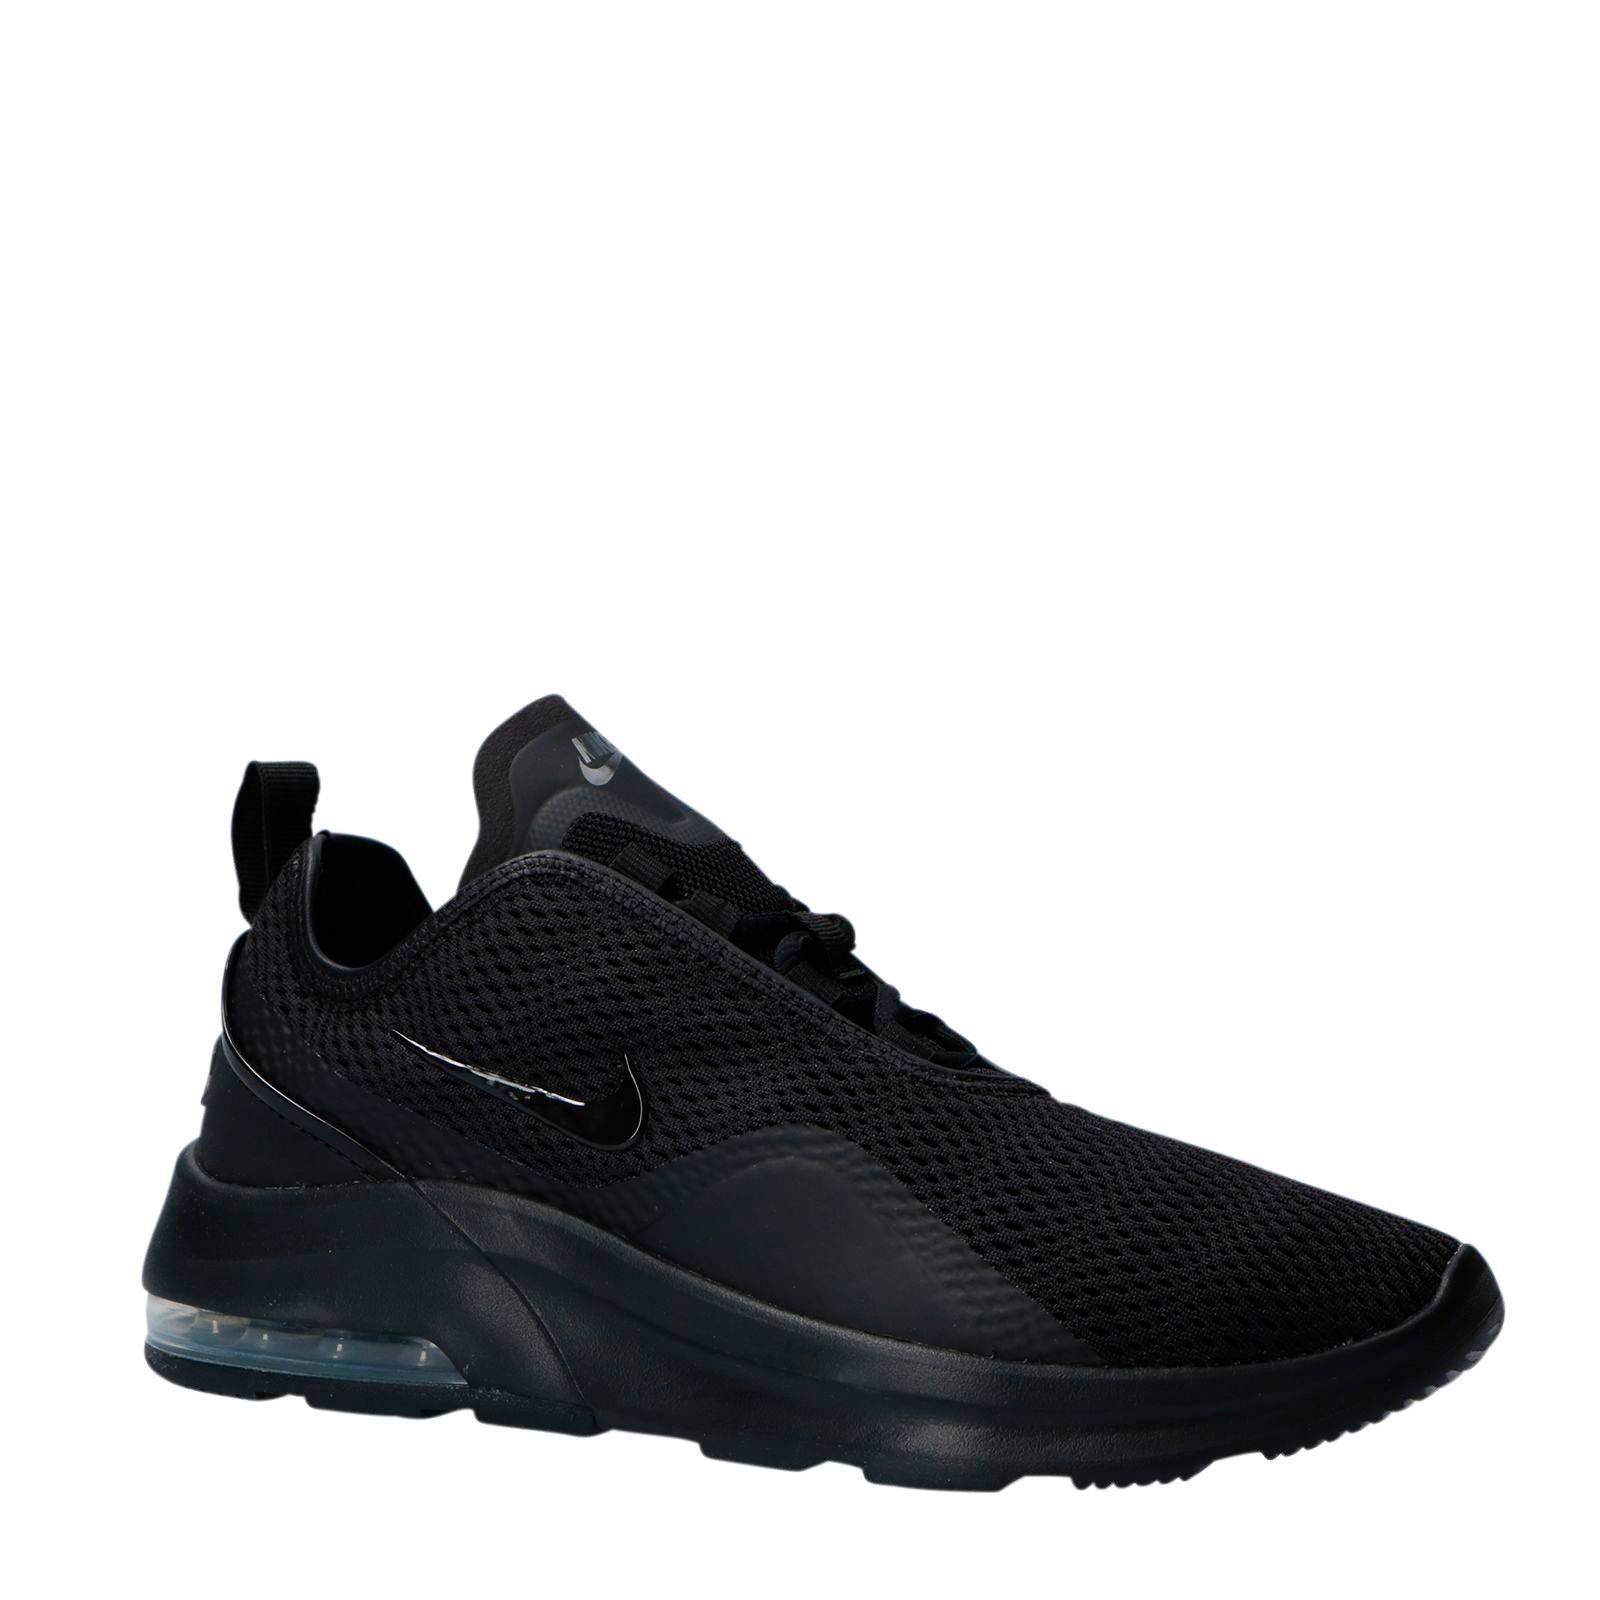 6607d364acb nike-air-max-motion-2-sneakers-zwart-zwart-0886066265771.jpg